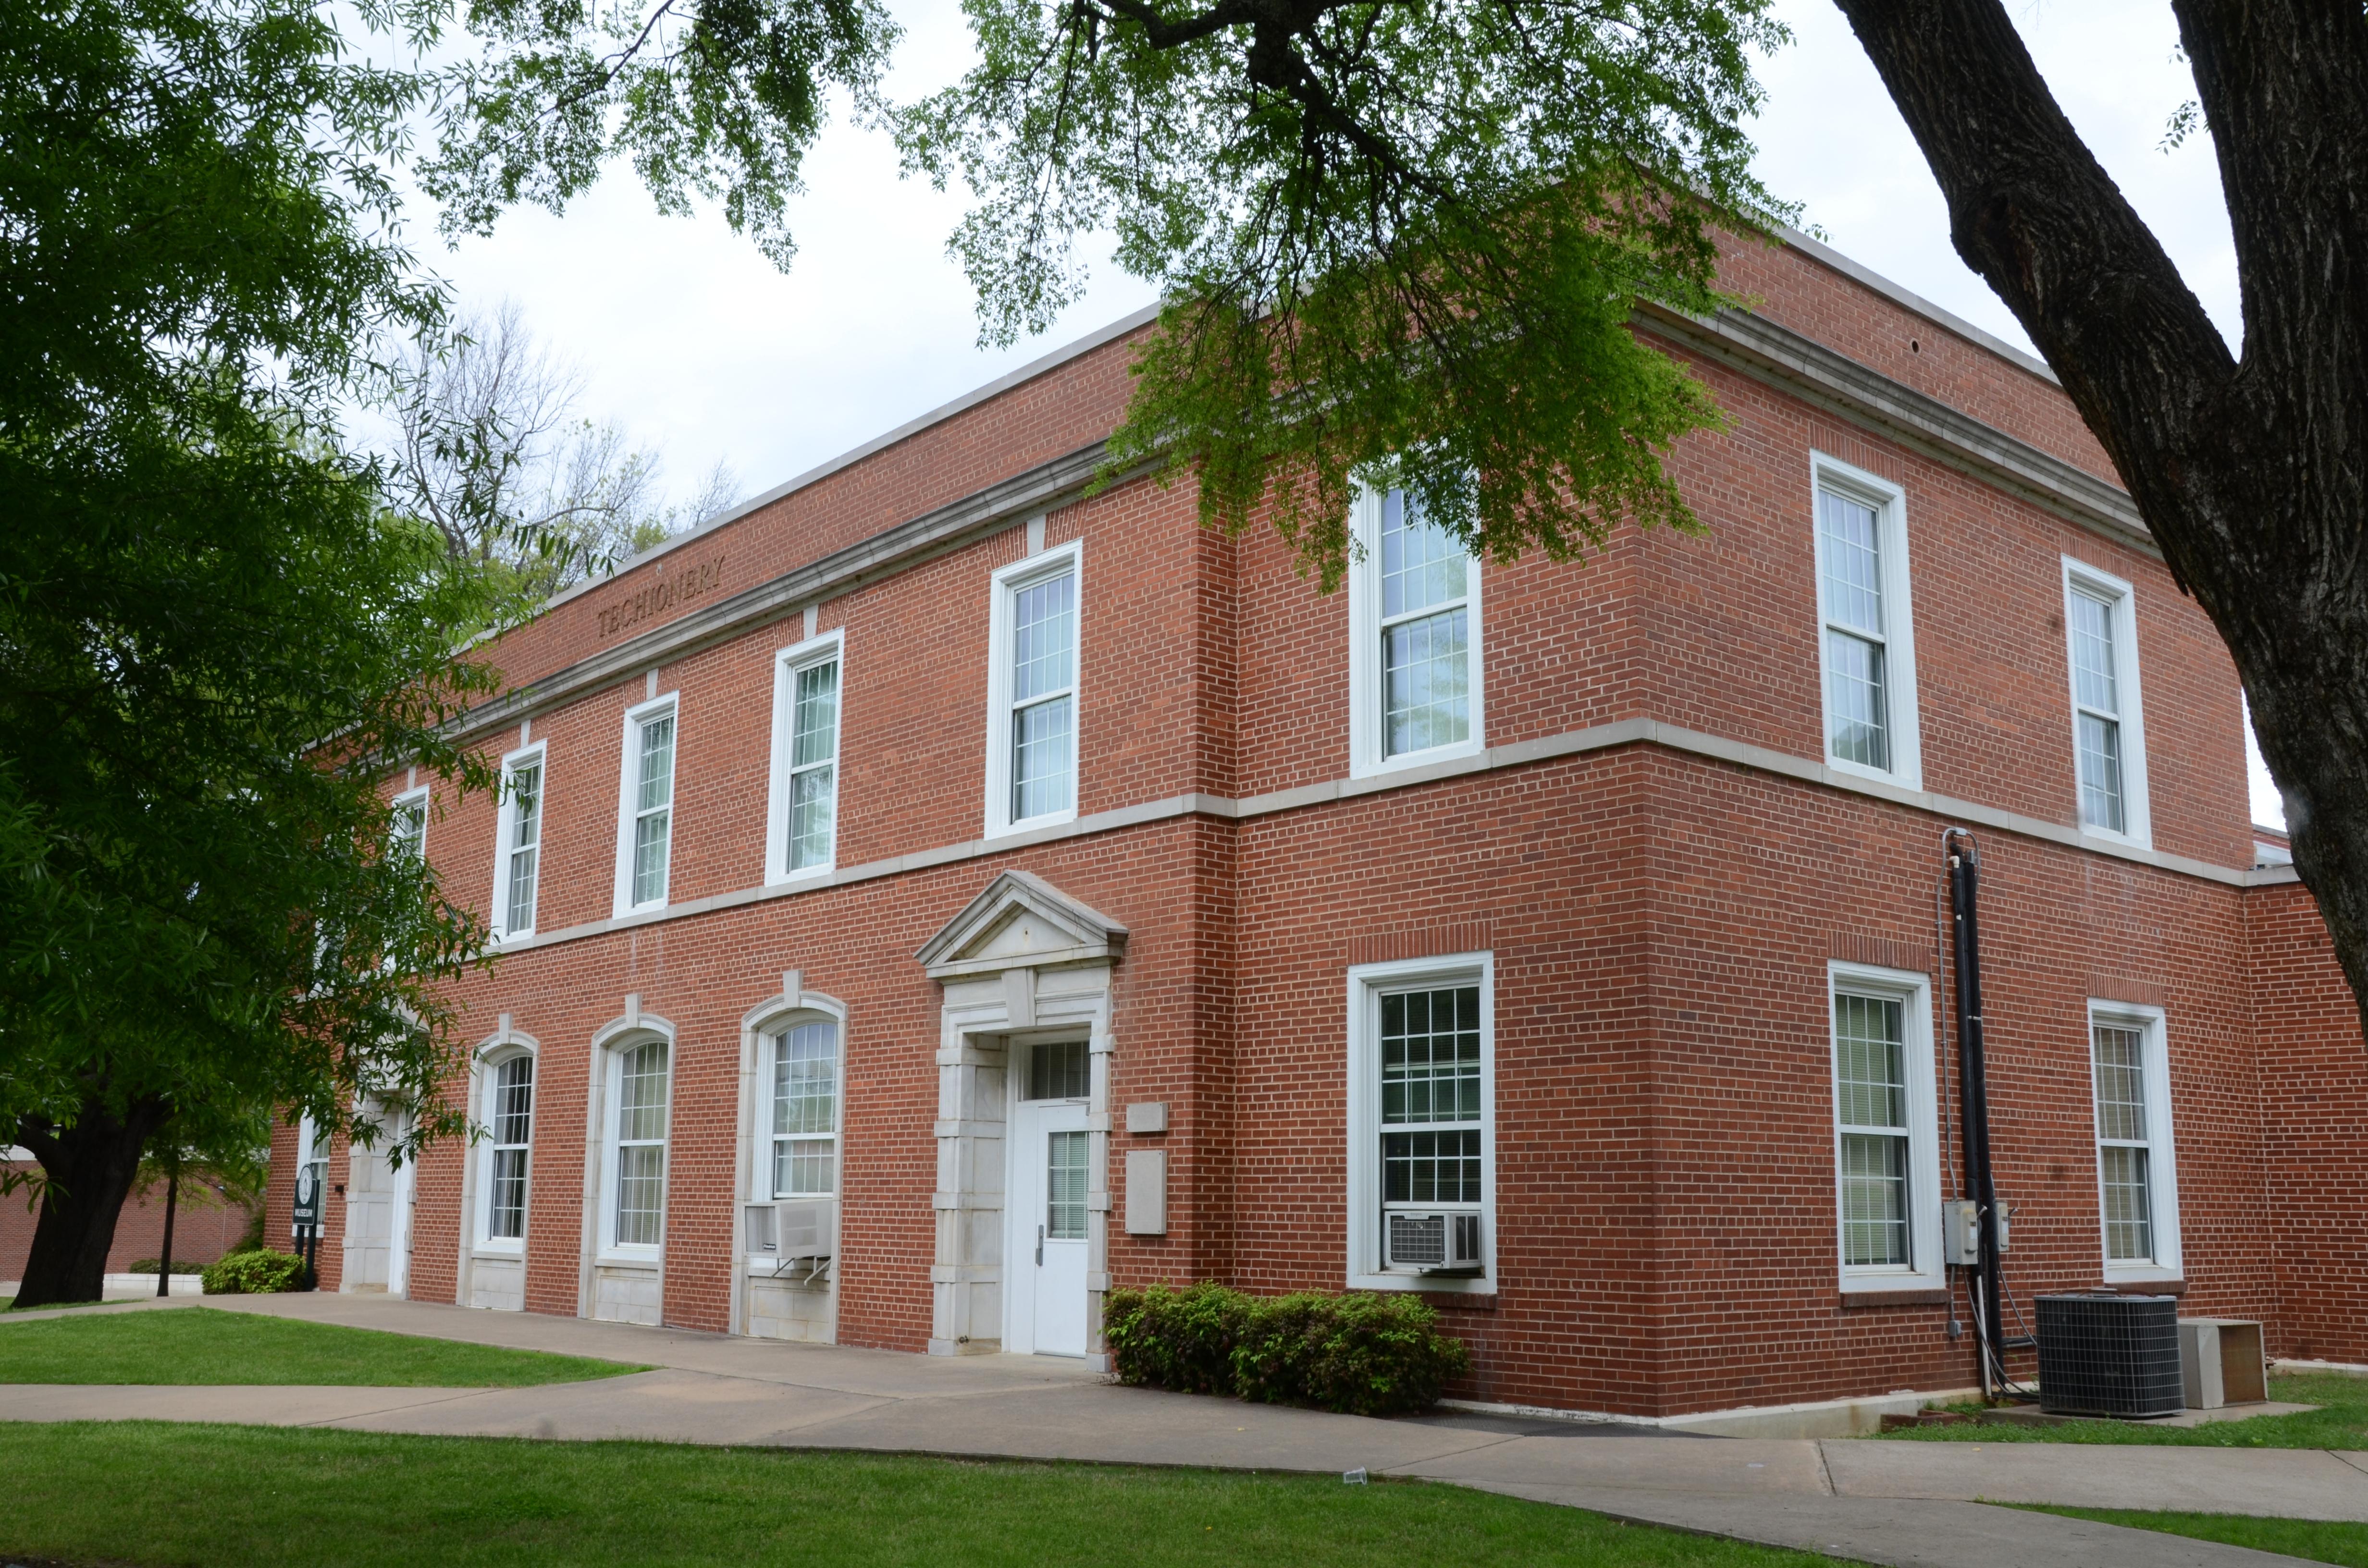 File:Physical Education Building—Arkansas Tech University